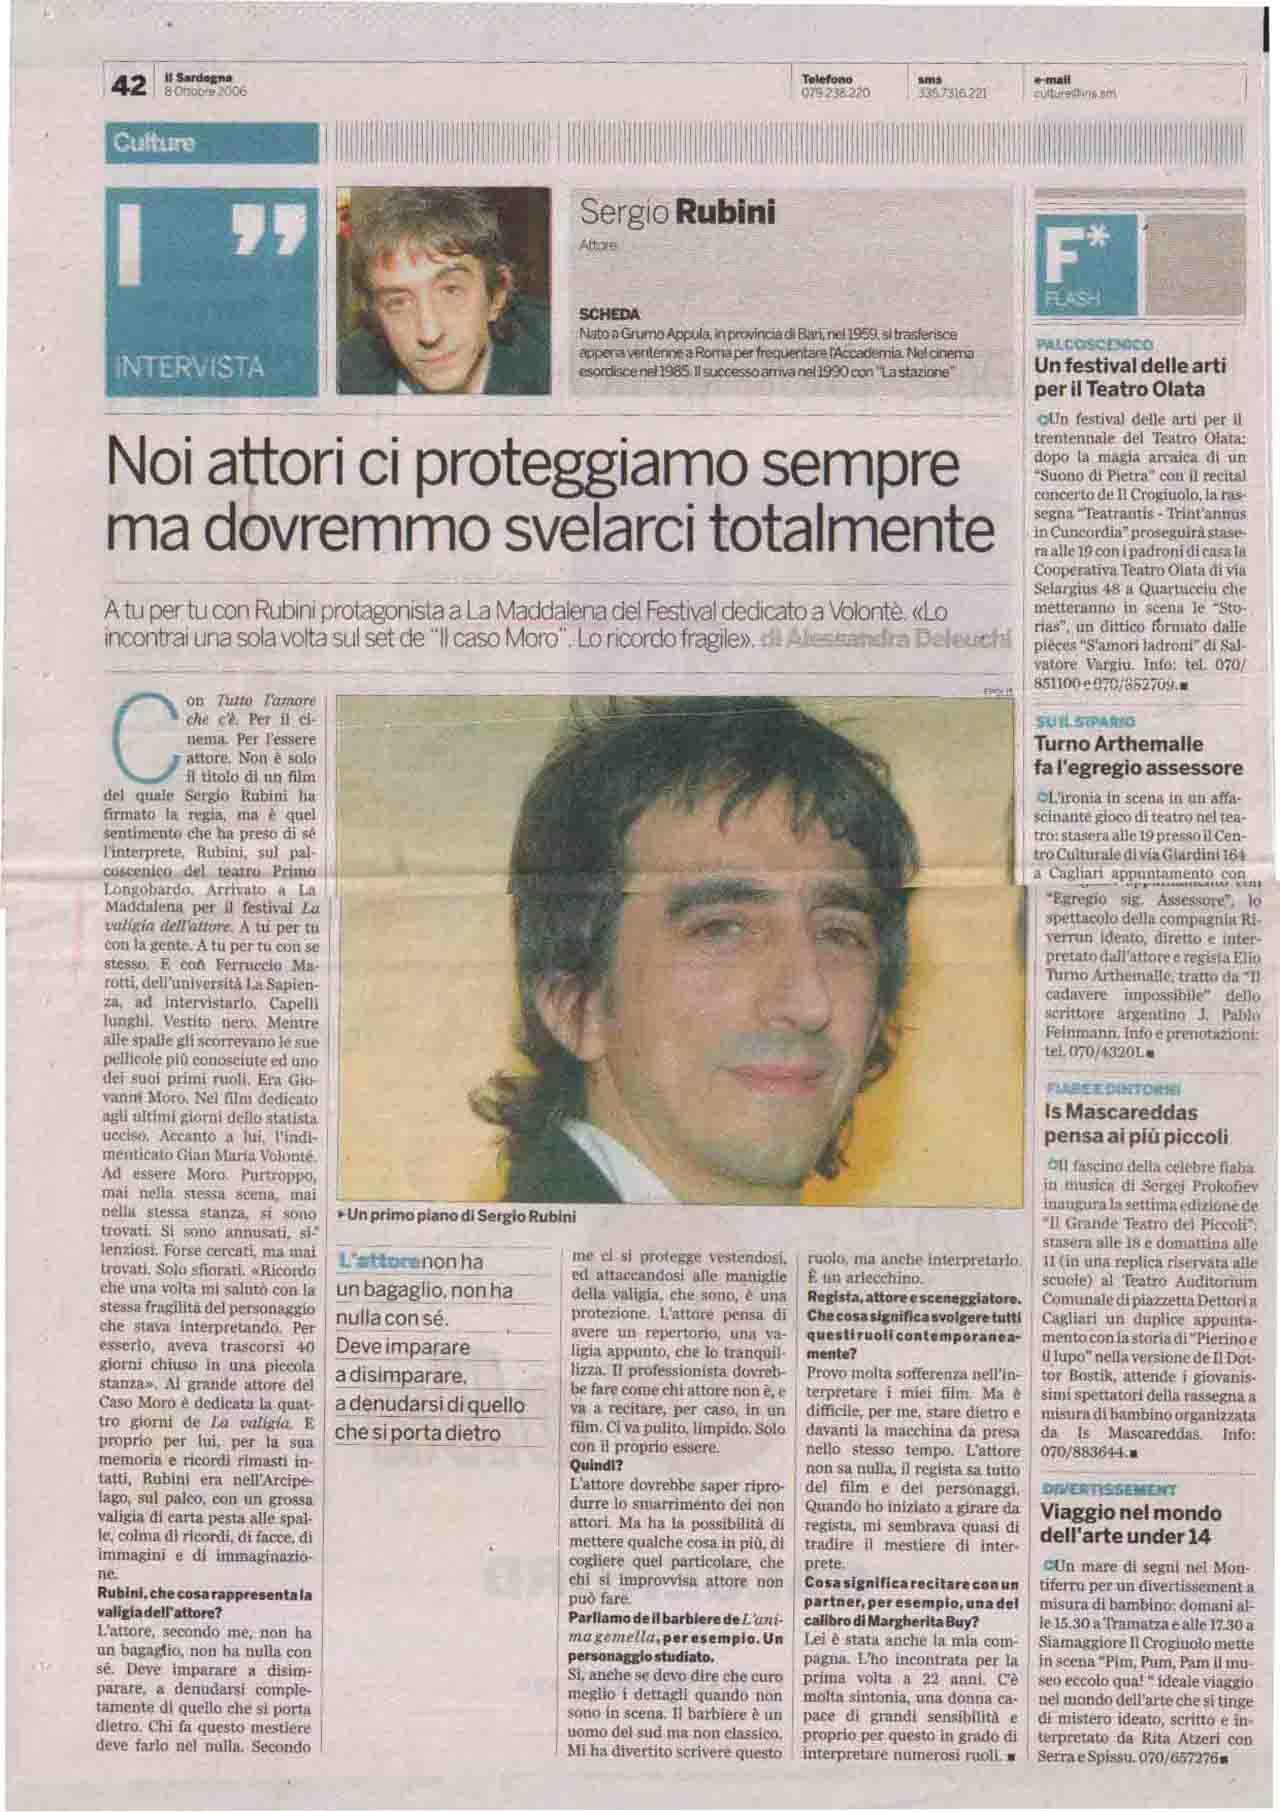 Il Sardegna (Culture) 8 ott 2006